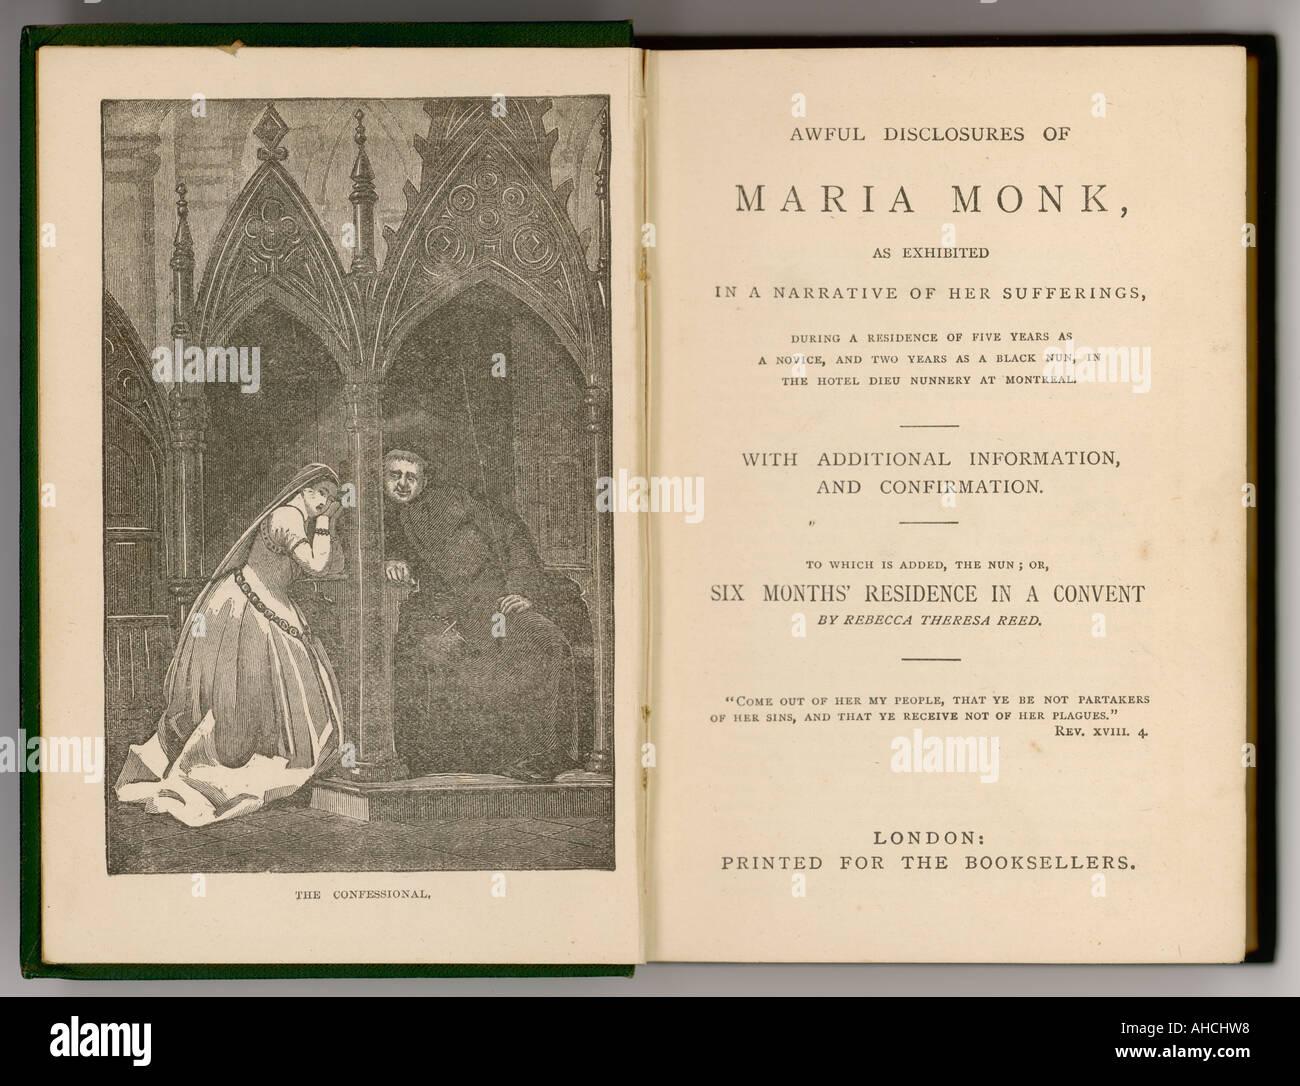 Maria Monk Revelations Stock Photo - Alamy